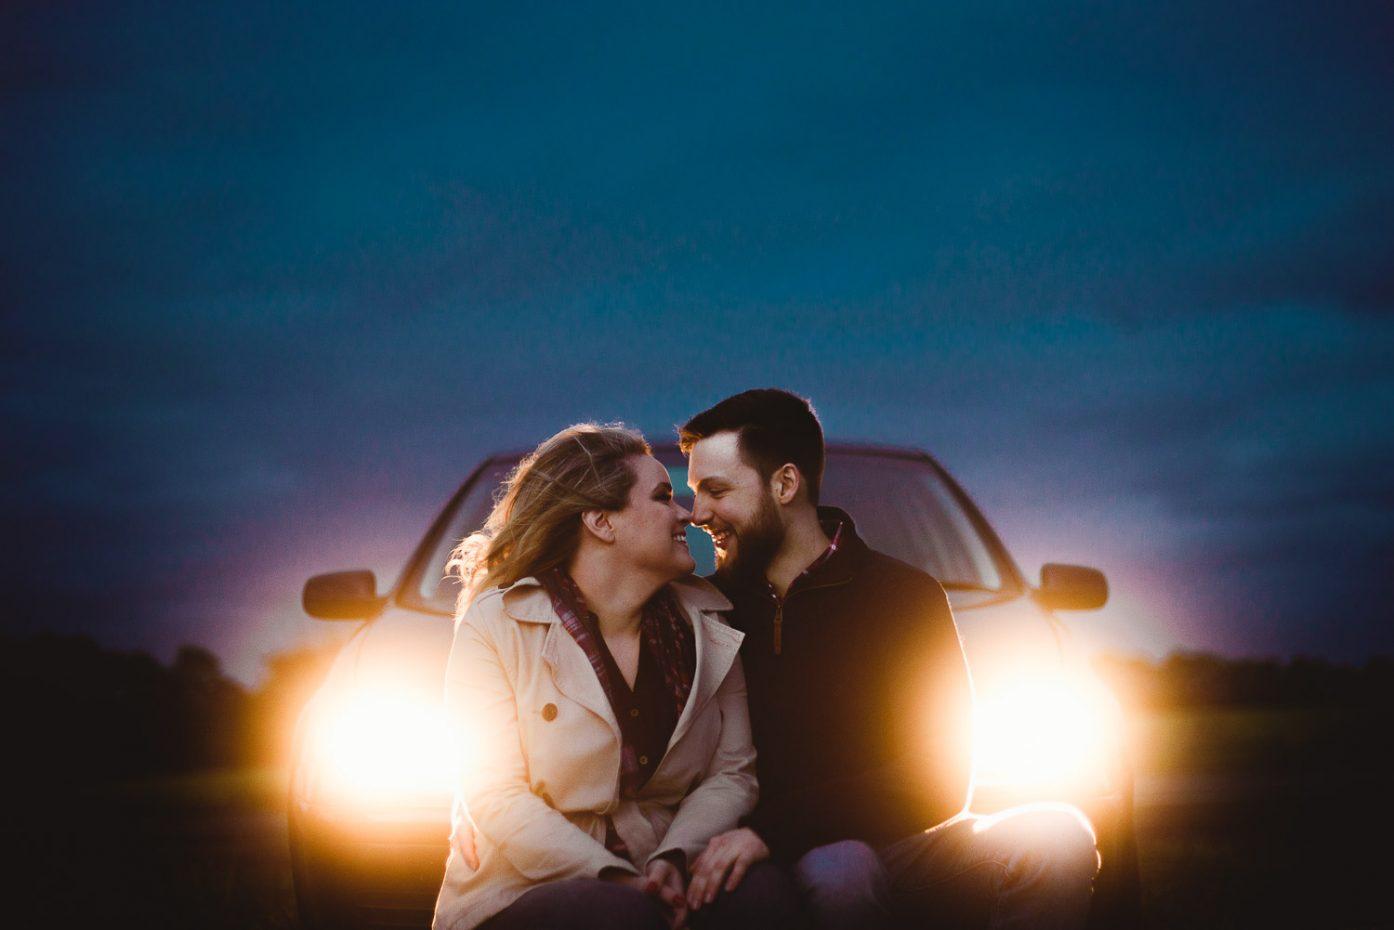 norfolk wedding photographer georgia rachael thetford engagement